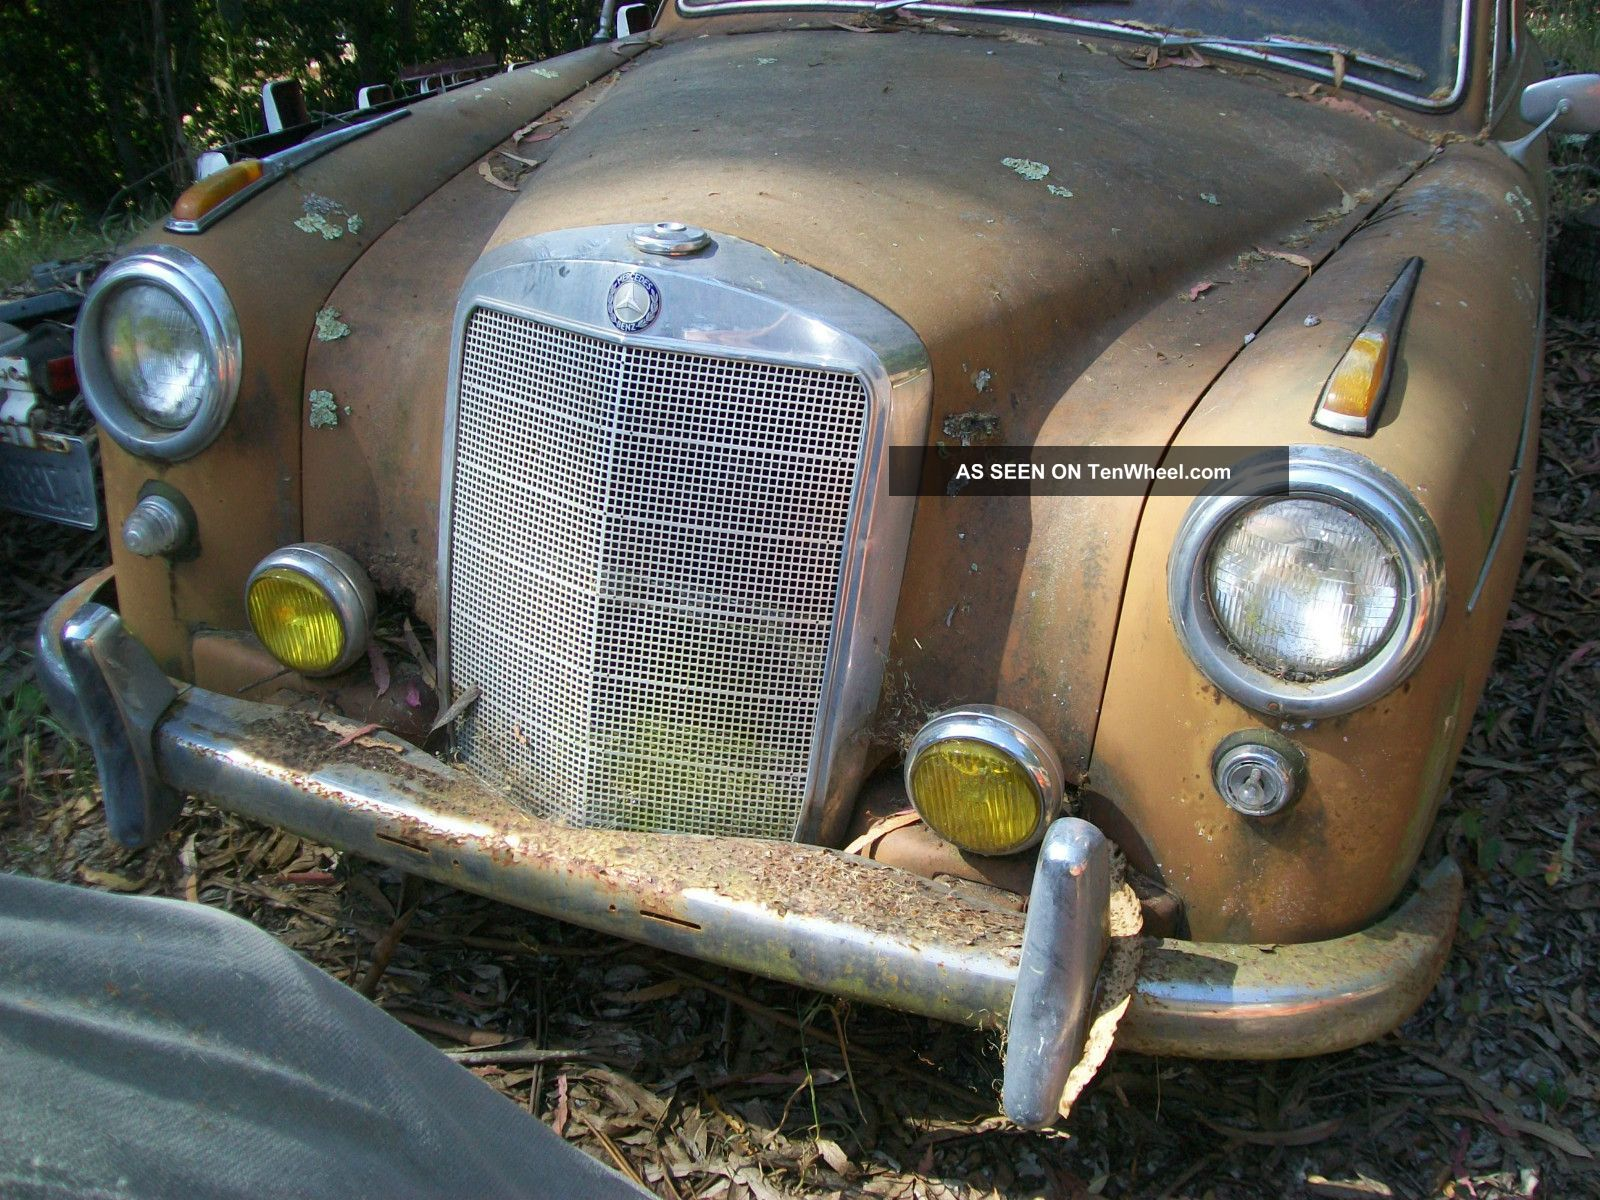 1959 Mercedes - Benz 200 - Series - Ponton Complete Car For Restroation 200-Series photo